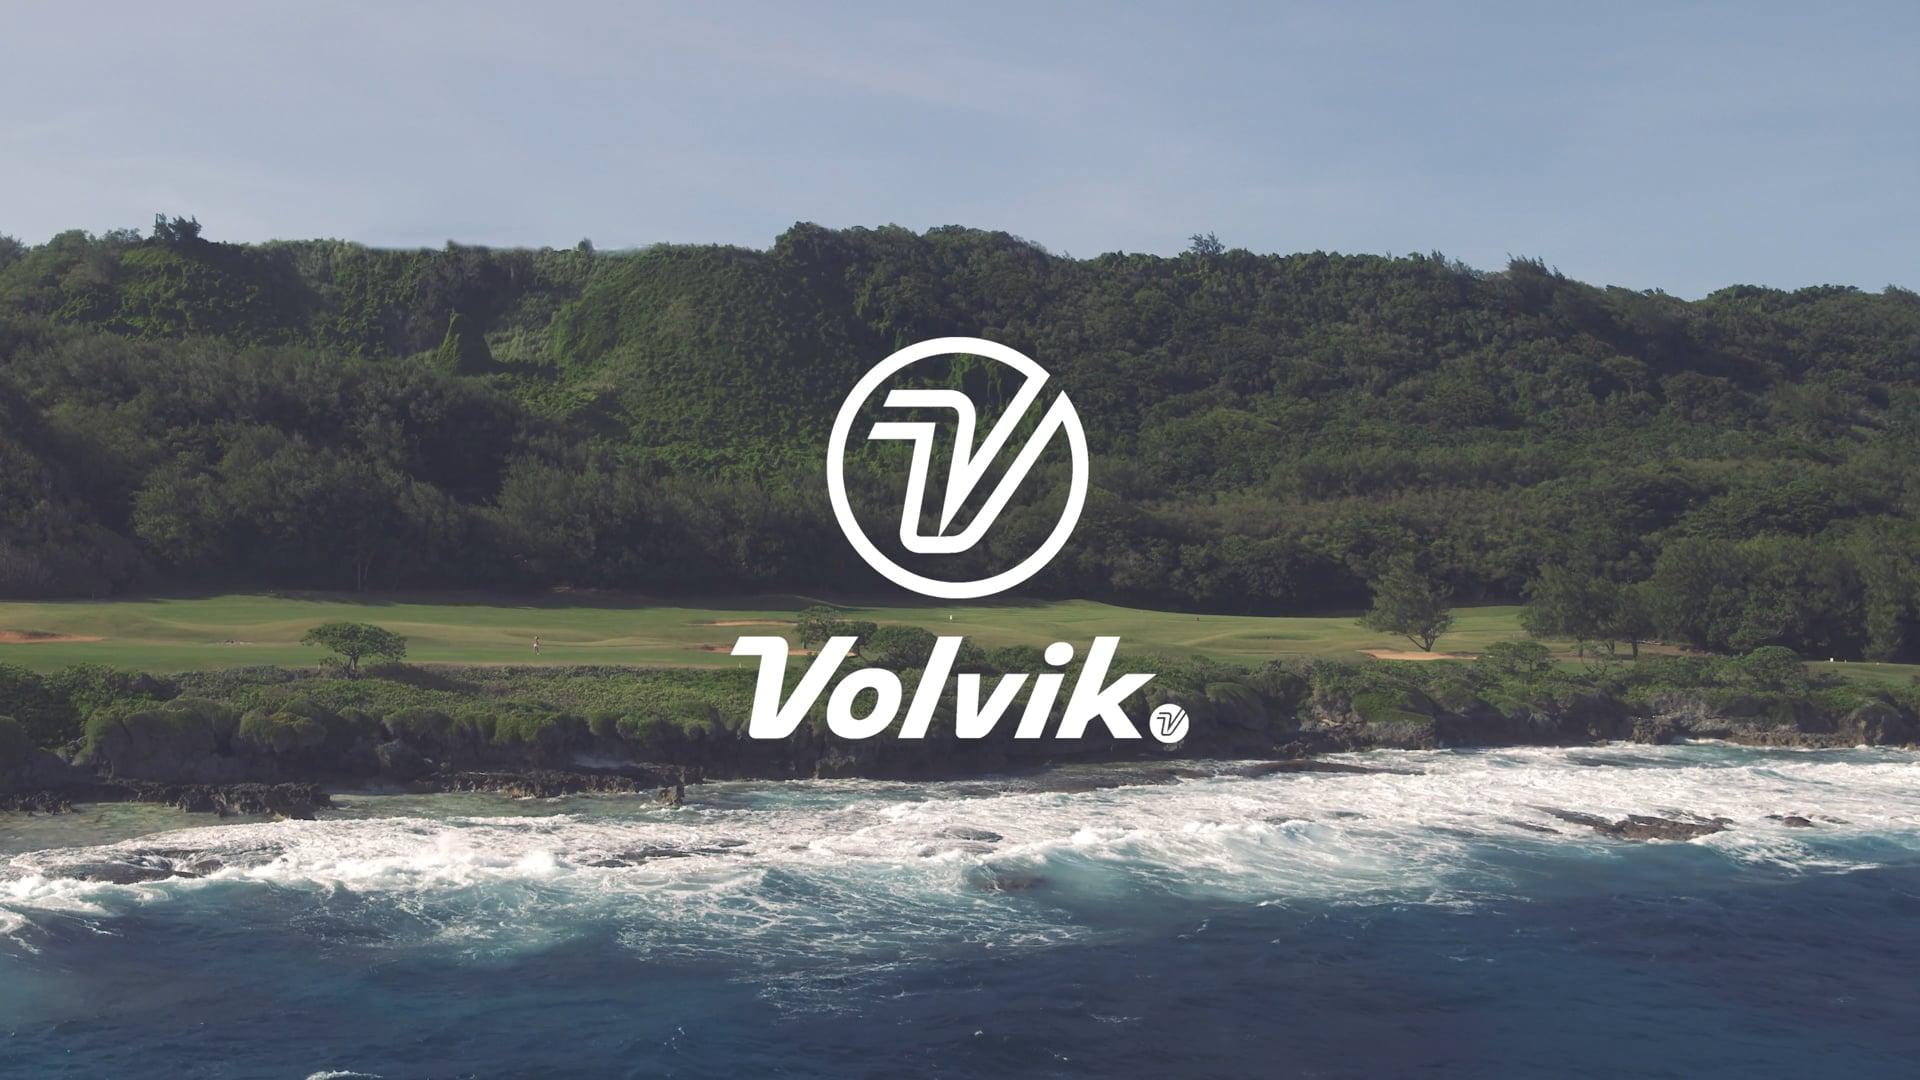 Volvik - 2020 S/S TV CF